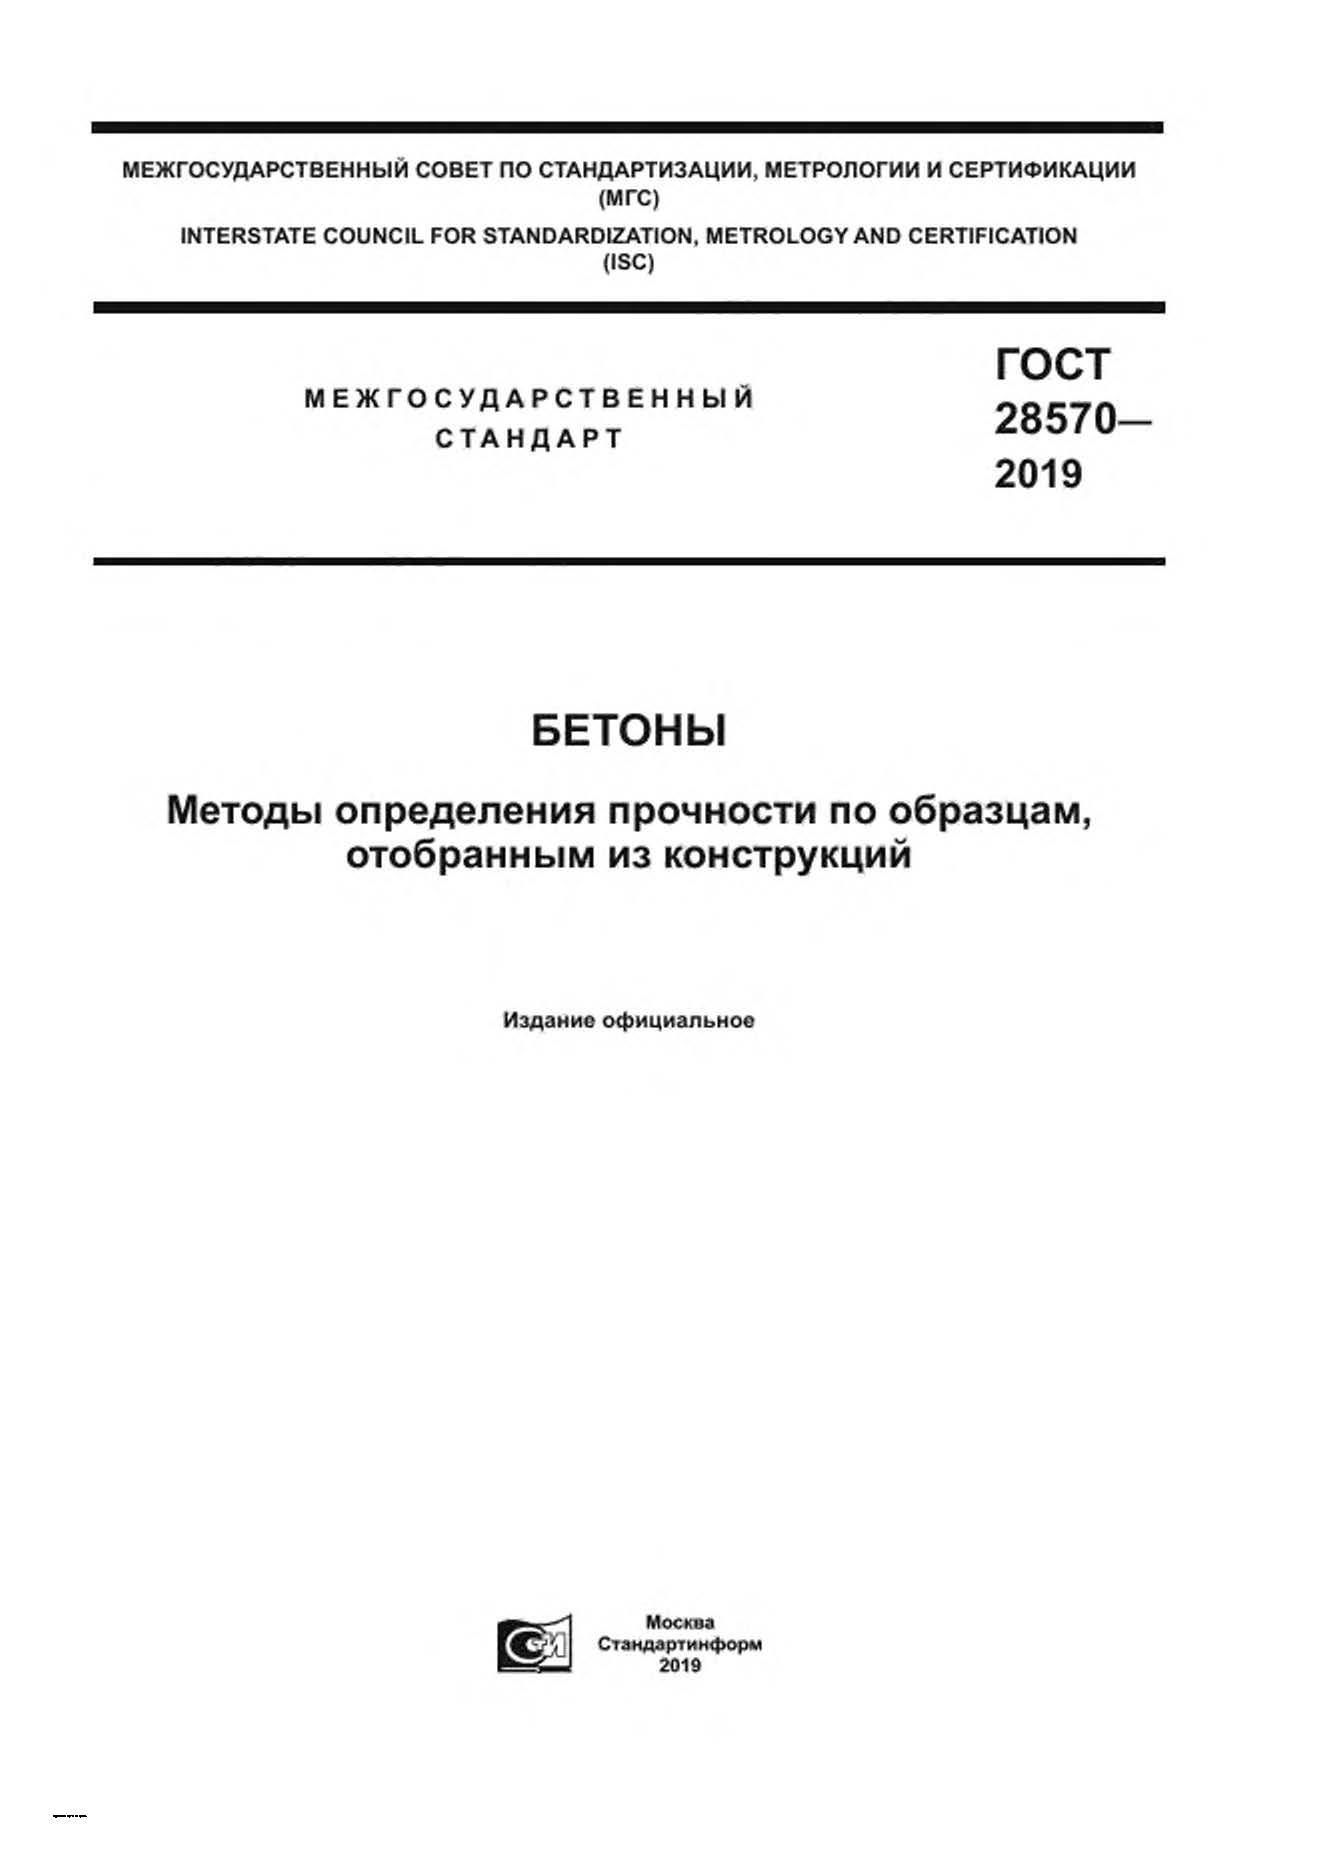 ГОСТ 28570-2019